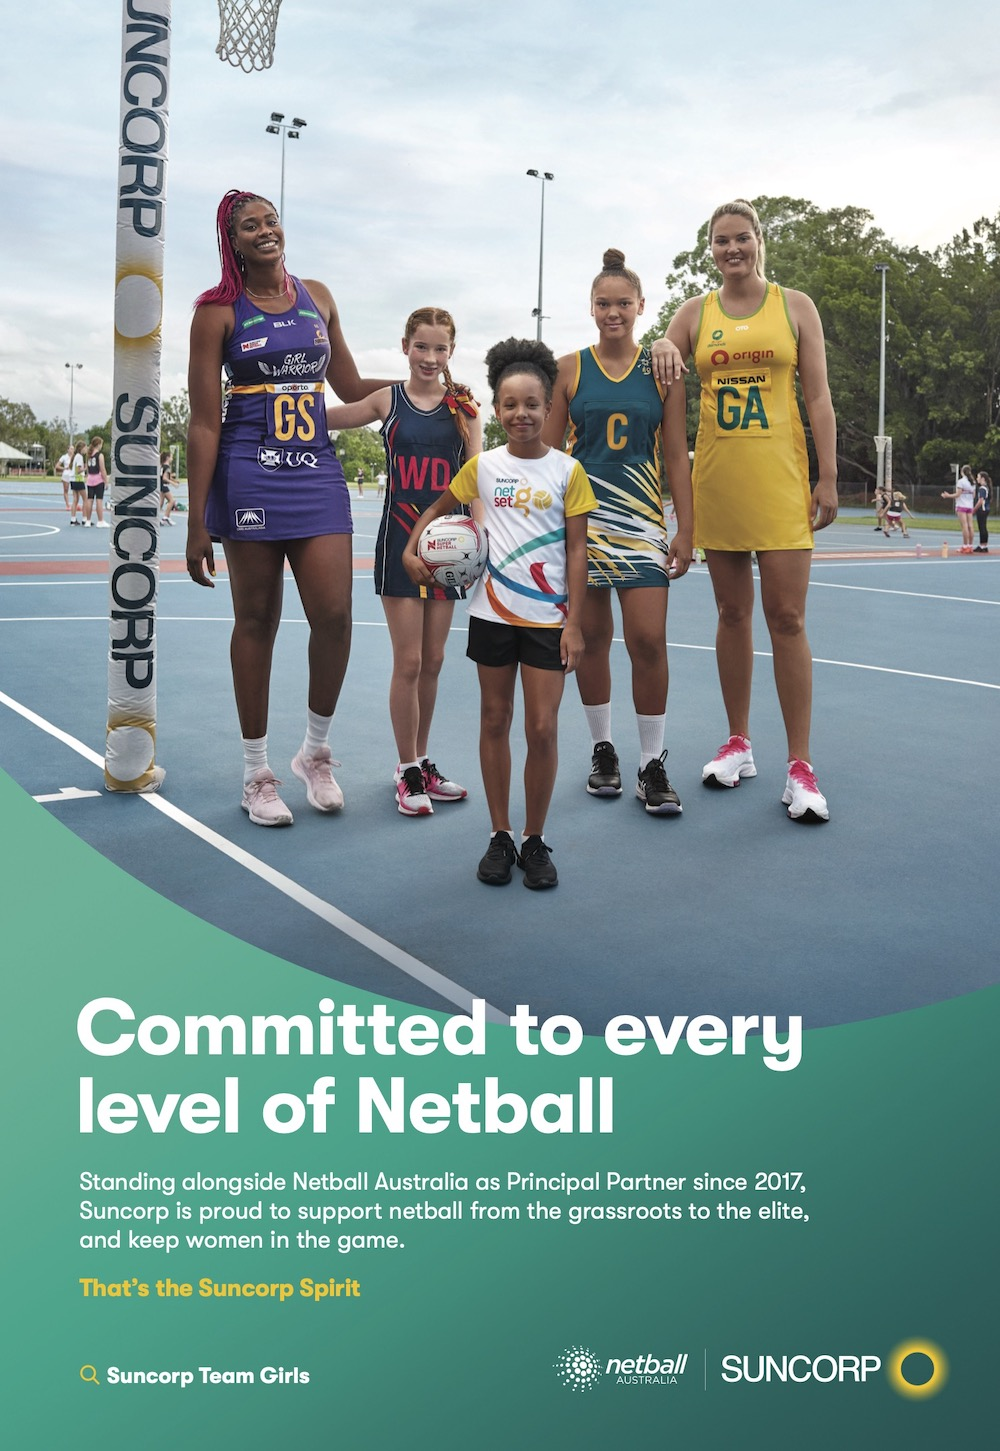 Suncorp's commitment to Netball shines in one family's story in new work via Leo Burnett